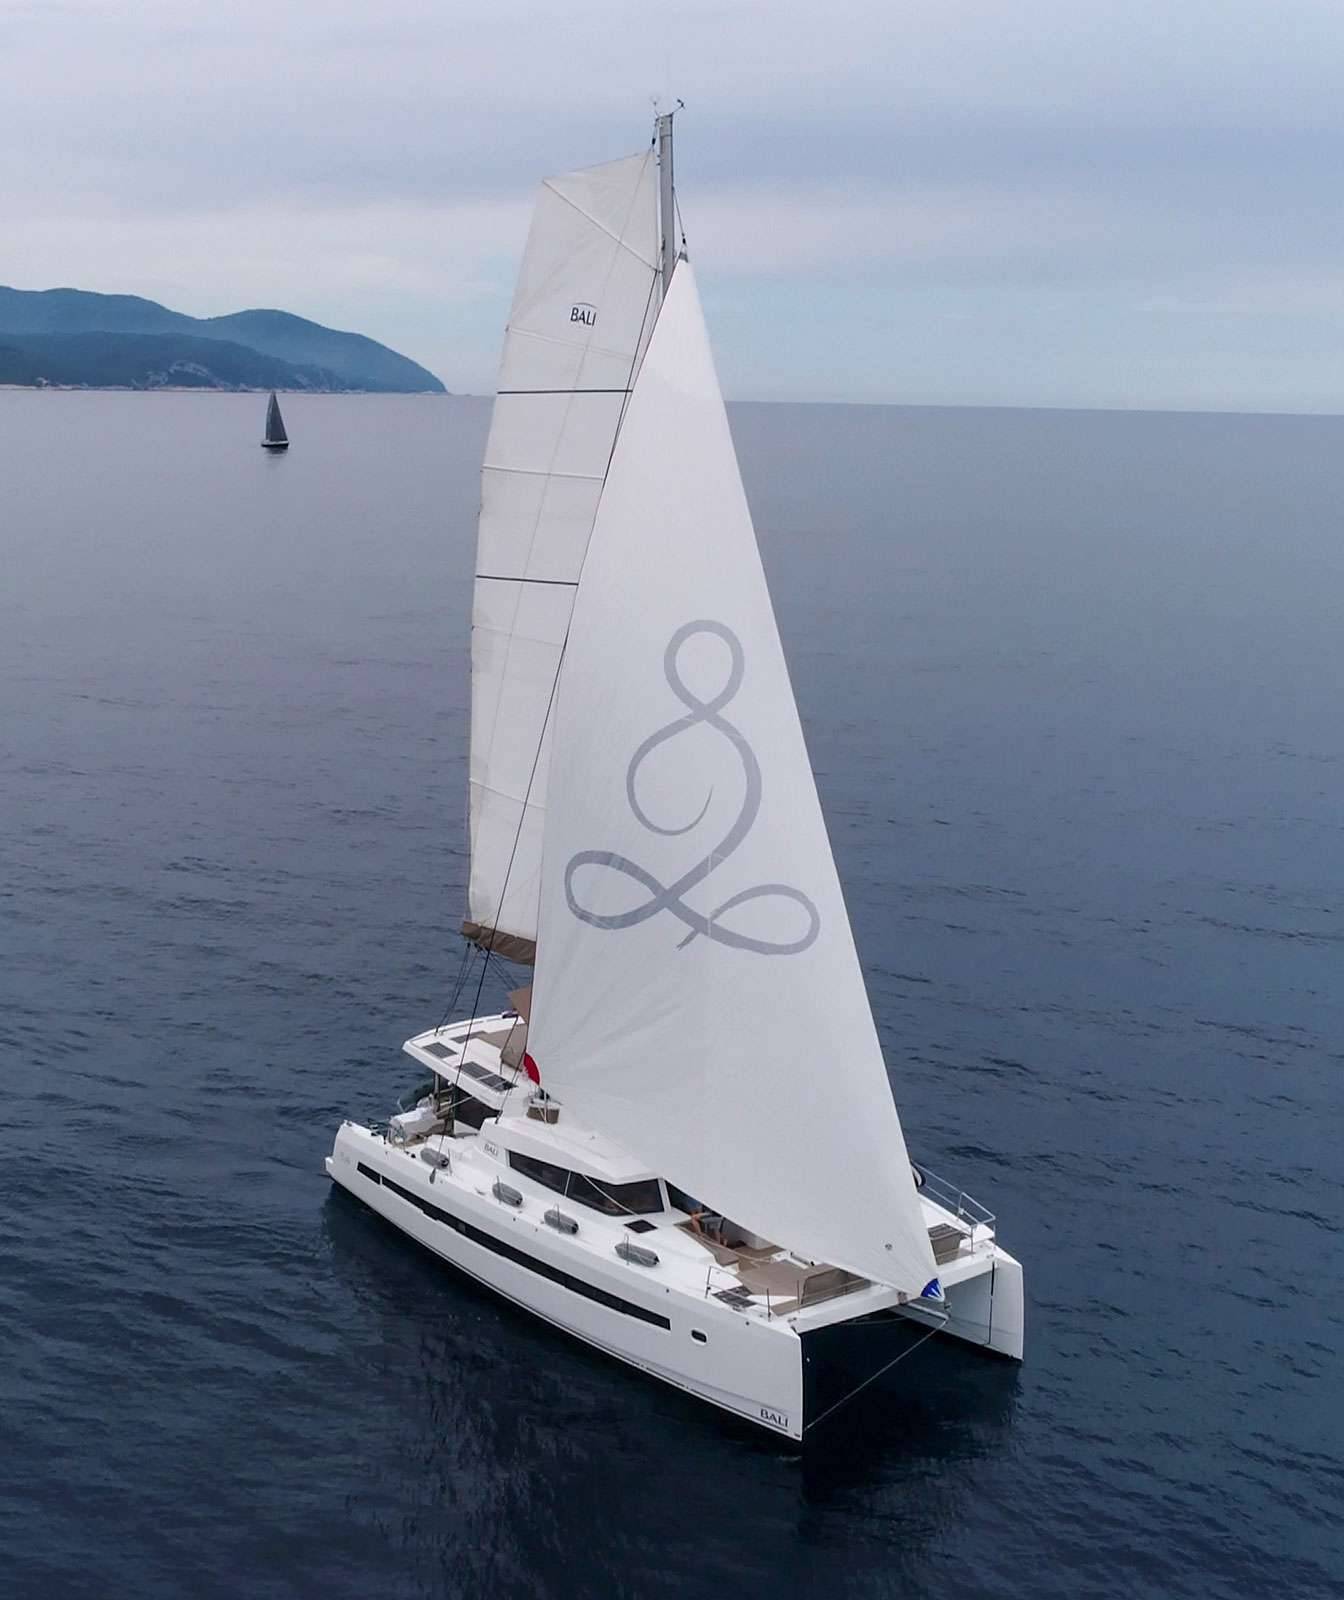 Sailing Yacht Namaste Of Bali (bali 5.4.)